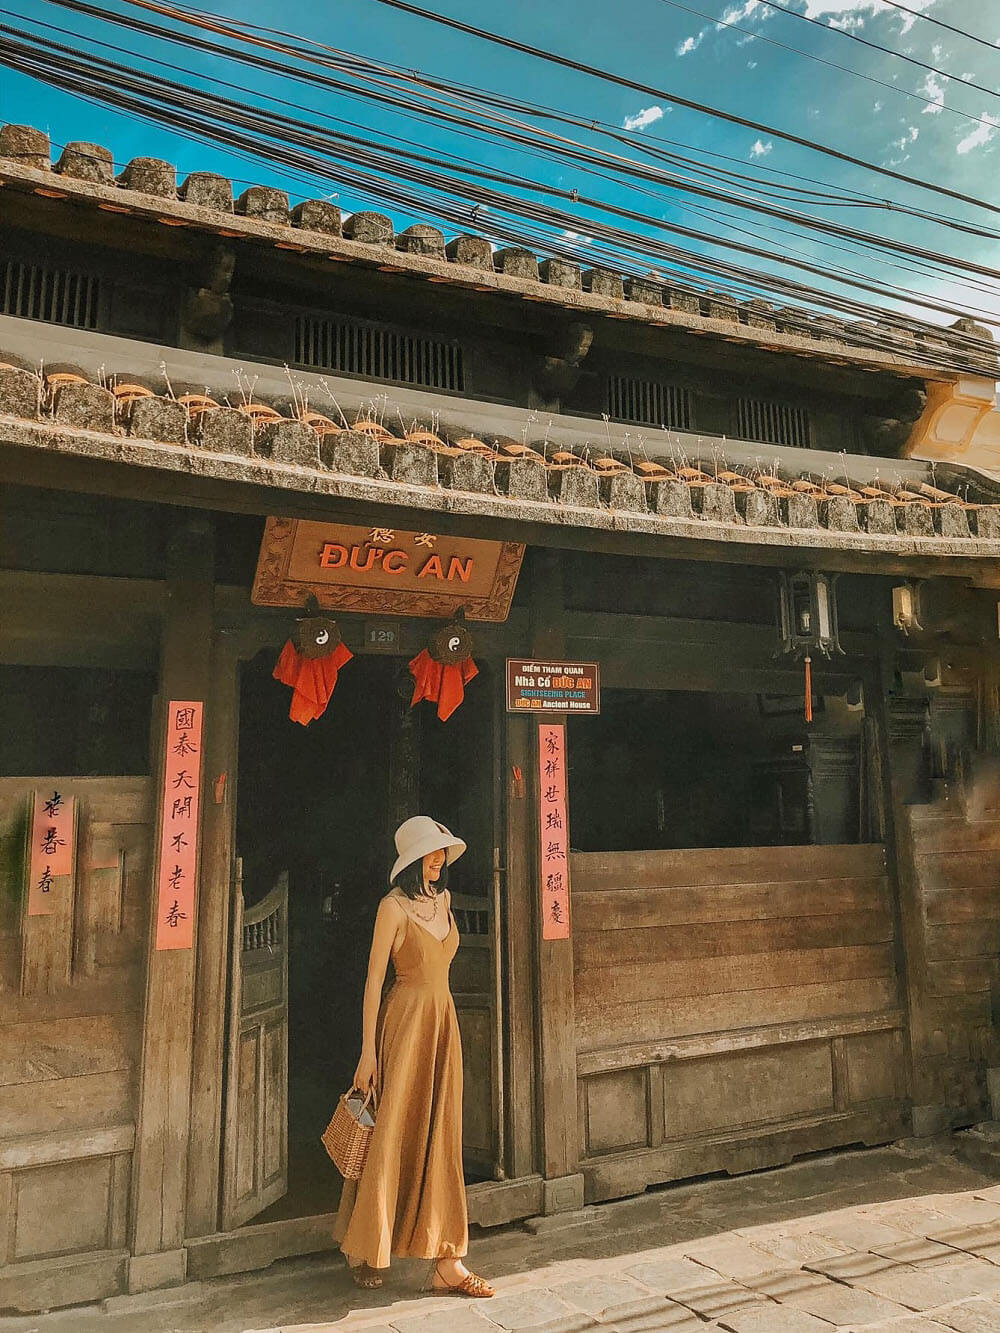 Review Kinh Nghiem Du Lich Da Nang Cho Gia Dinh Co Con Nho Pho Co Hoi An